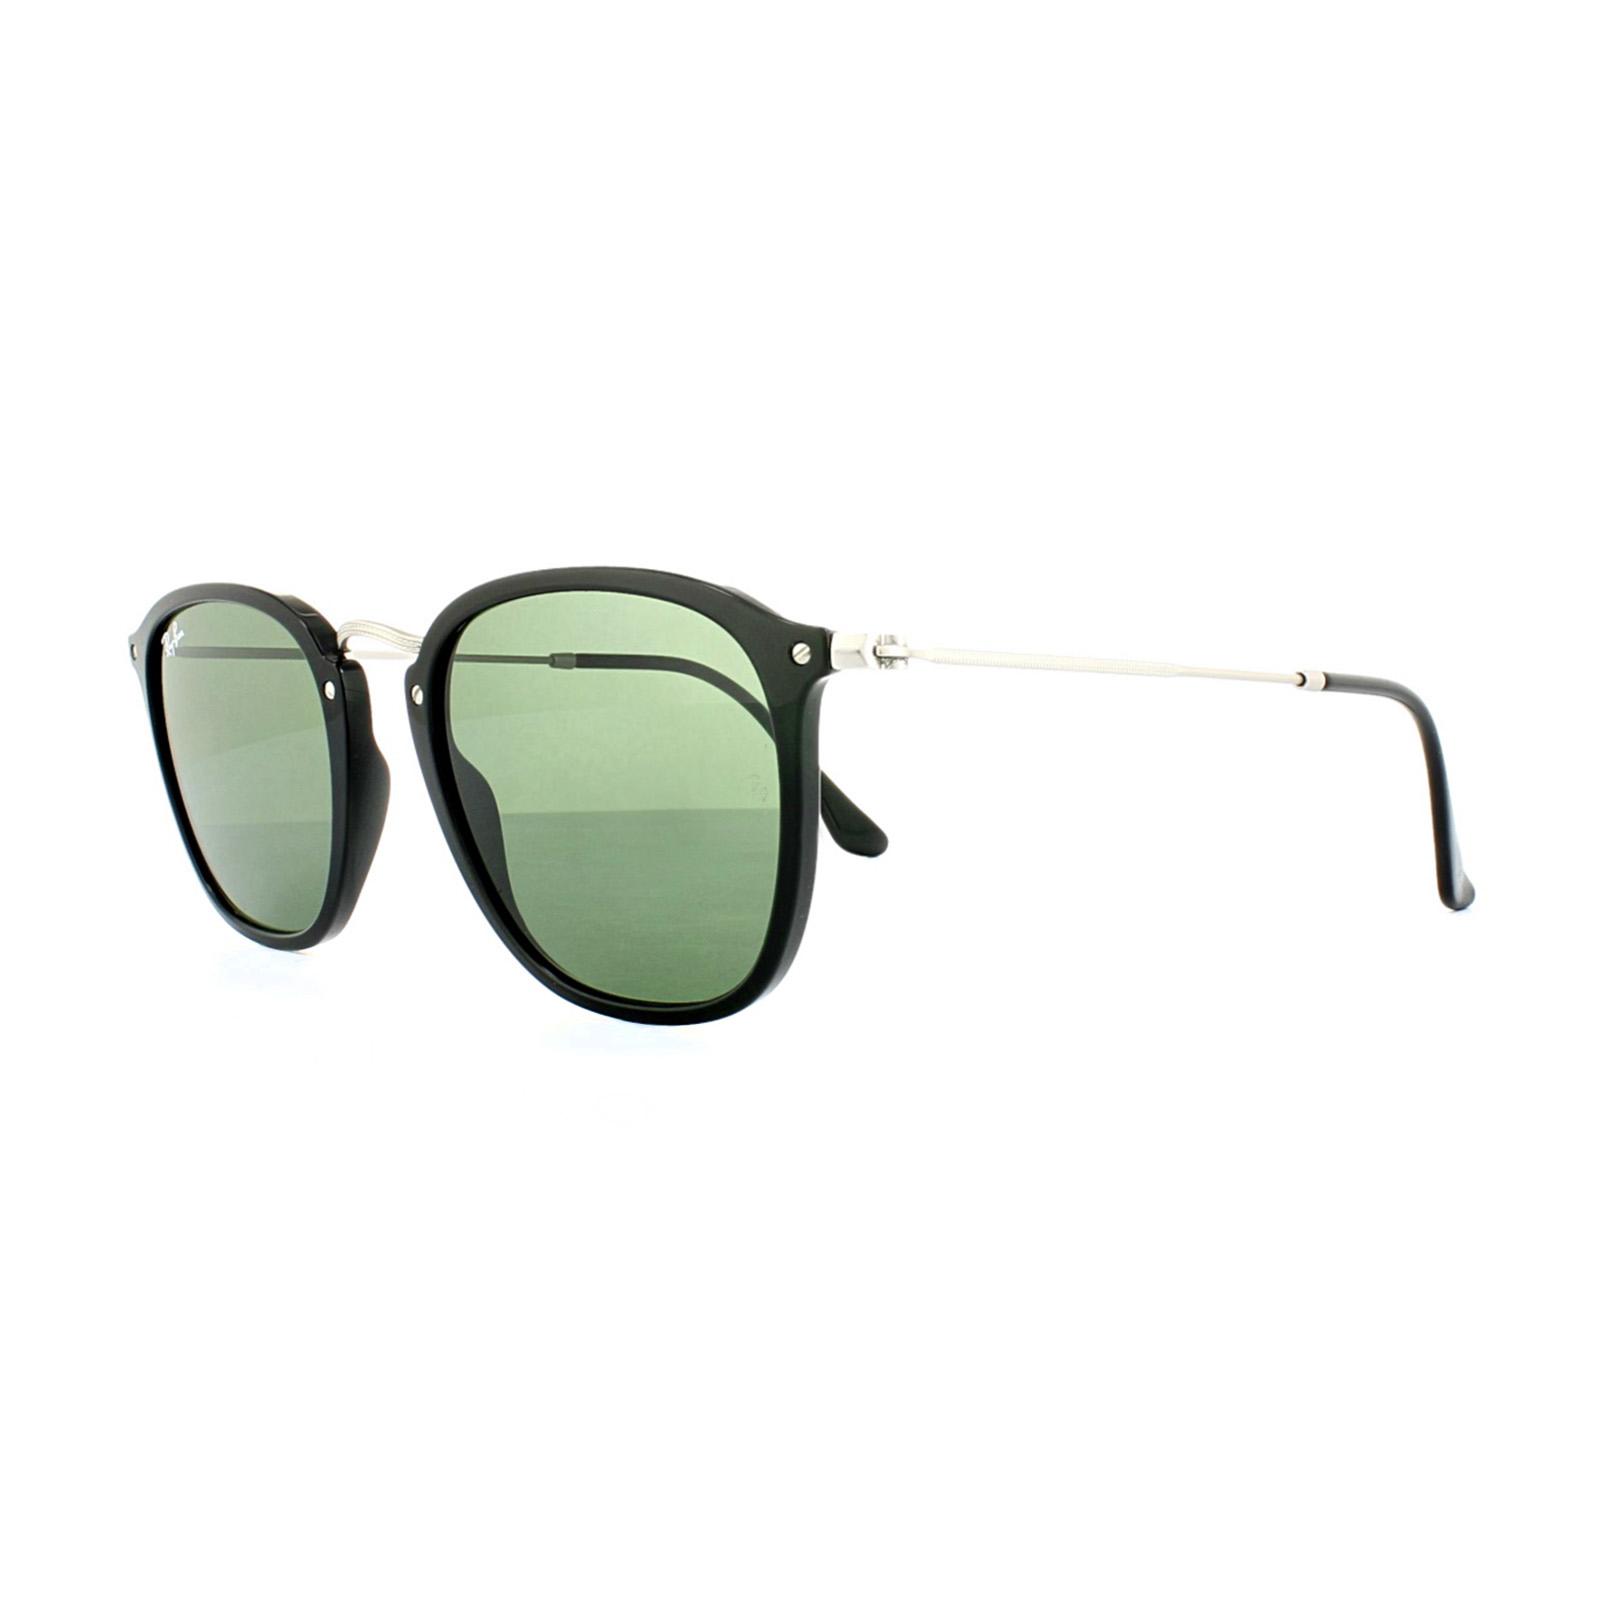 9dc05e454c4c Ray-Ban Sunglasses 2448N 901 Black Silver Green G-15 8053672672213 ...